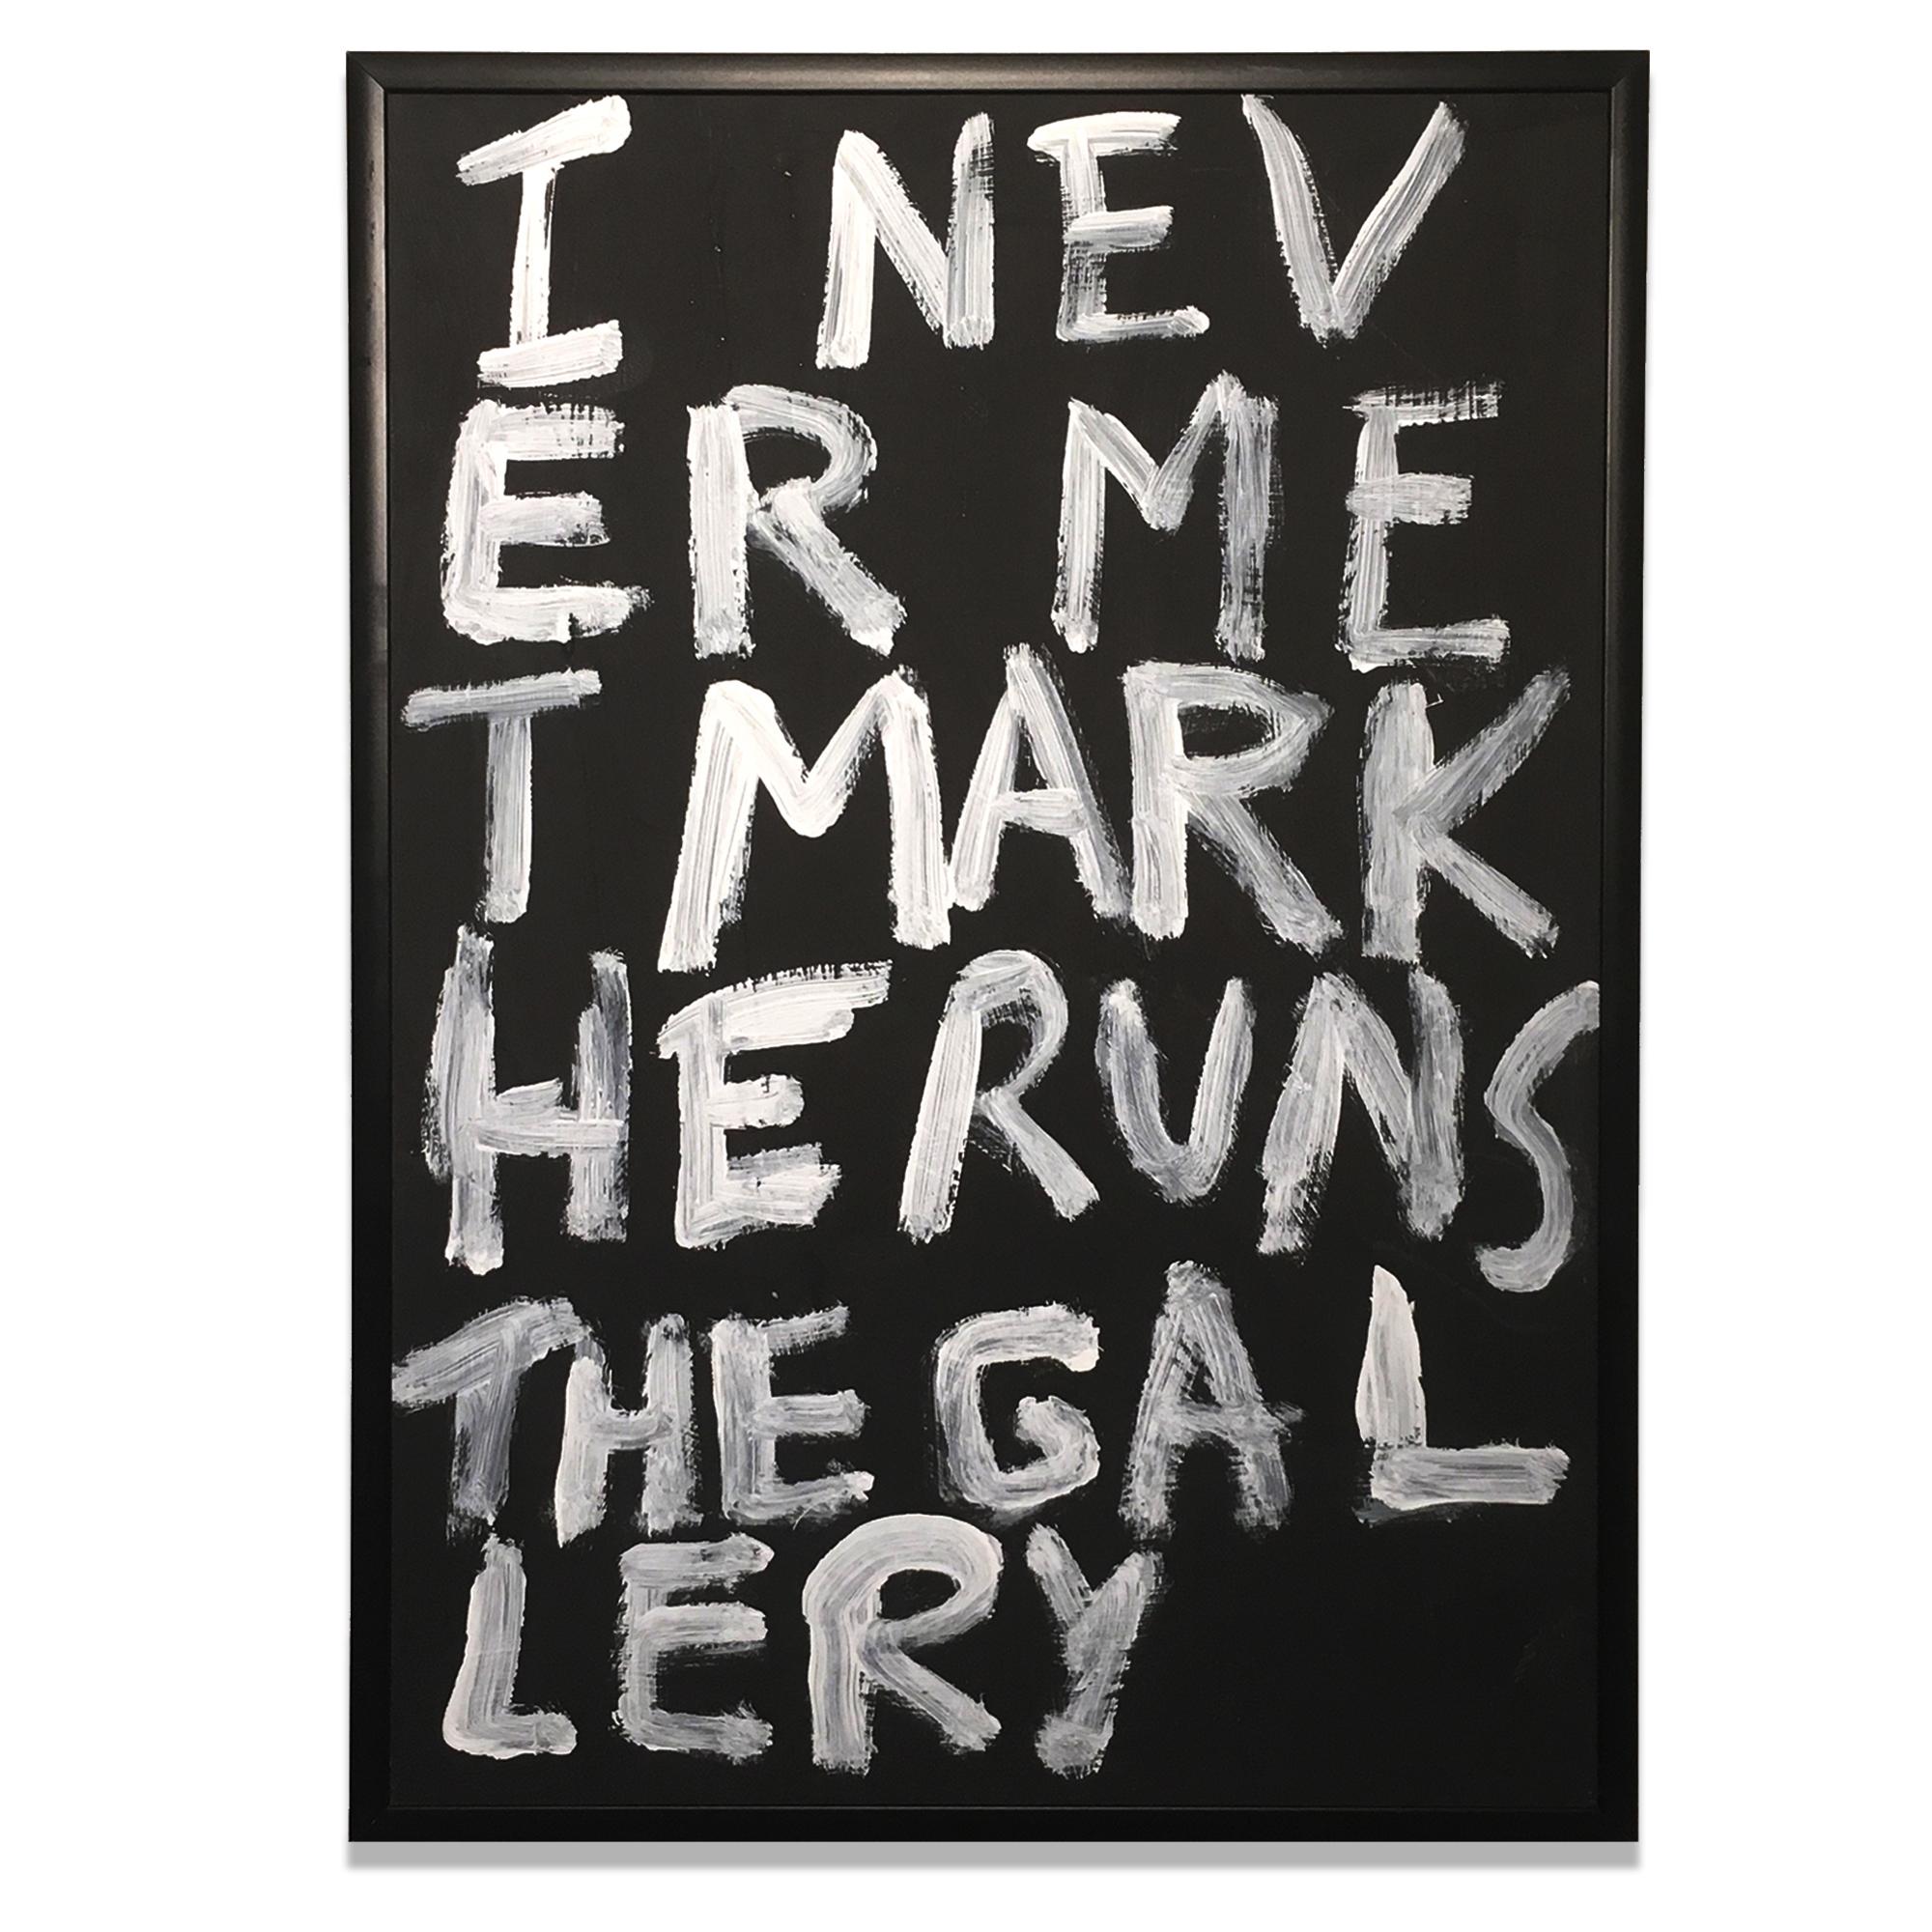 Adriano Costa: I Never Met Mark He Runs The Gallery (2018)